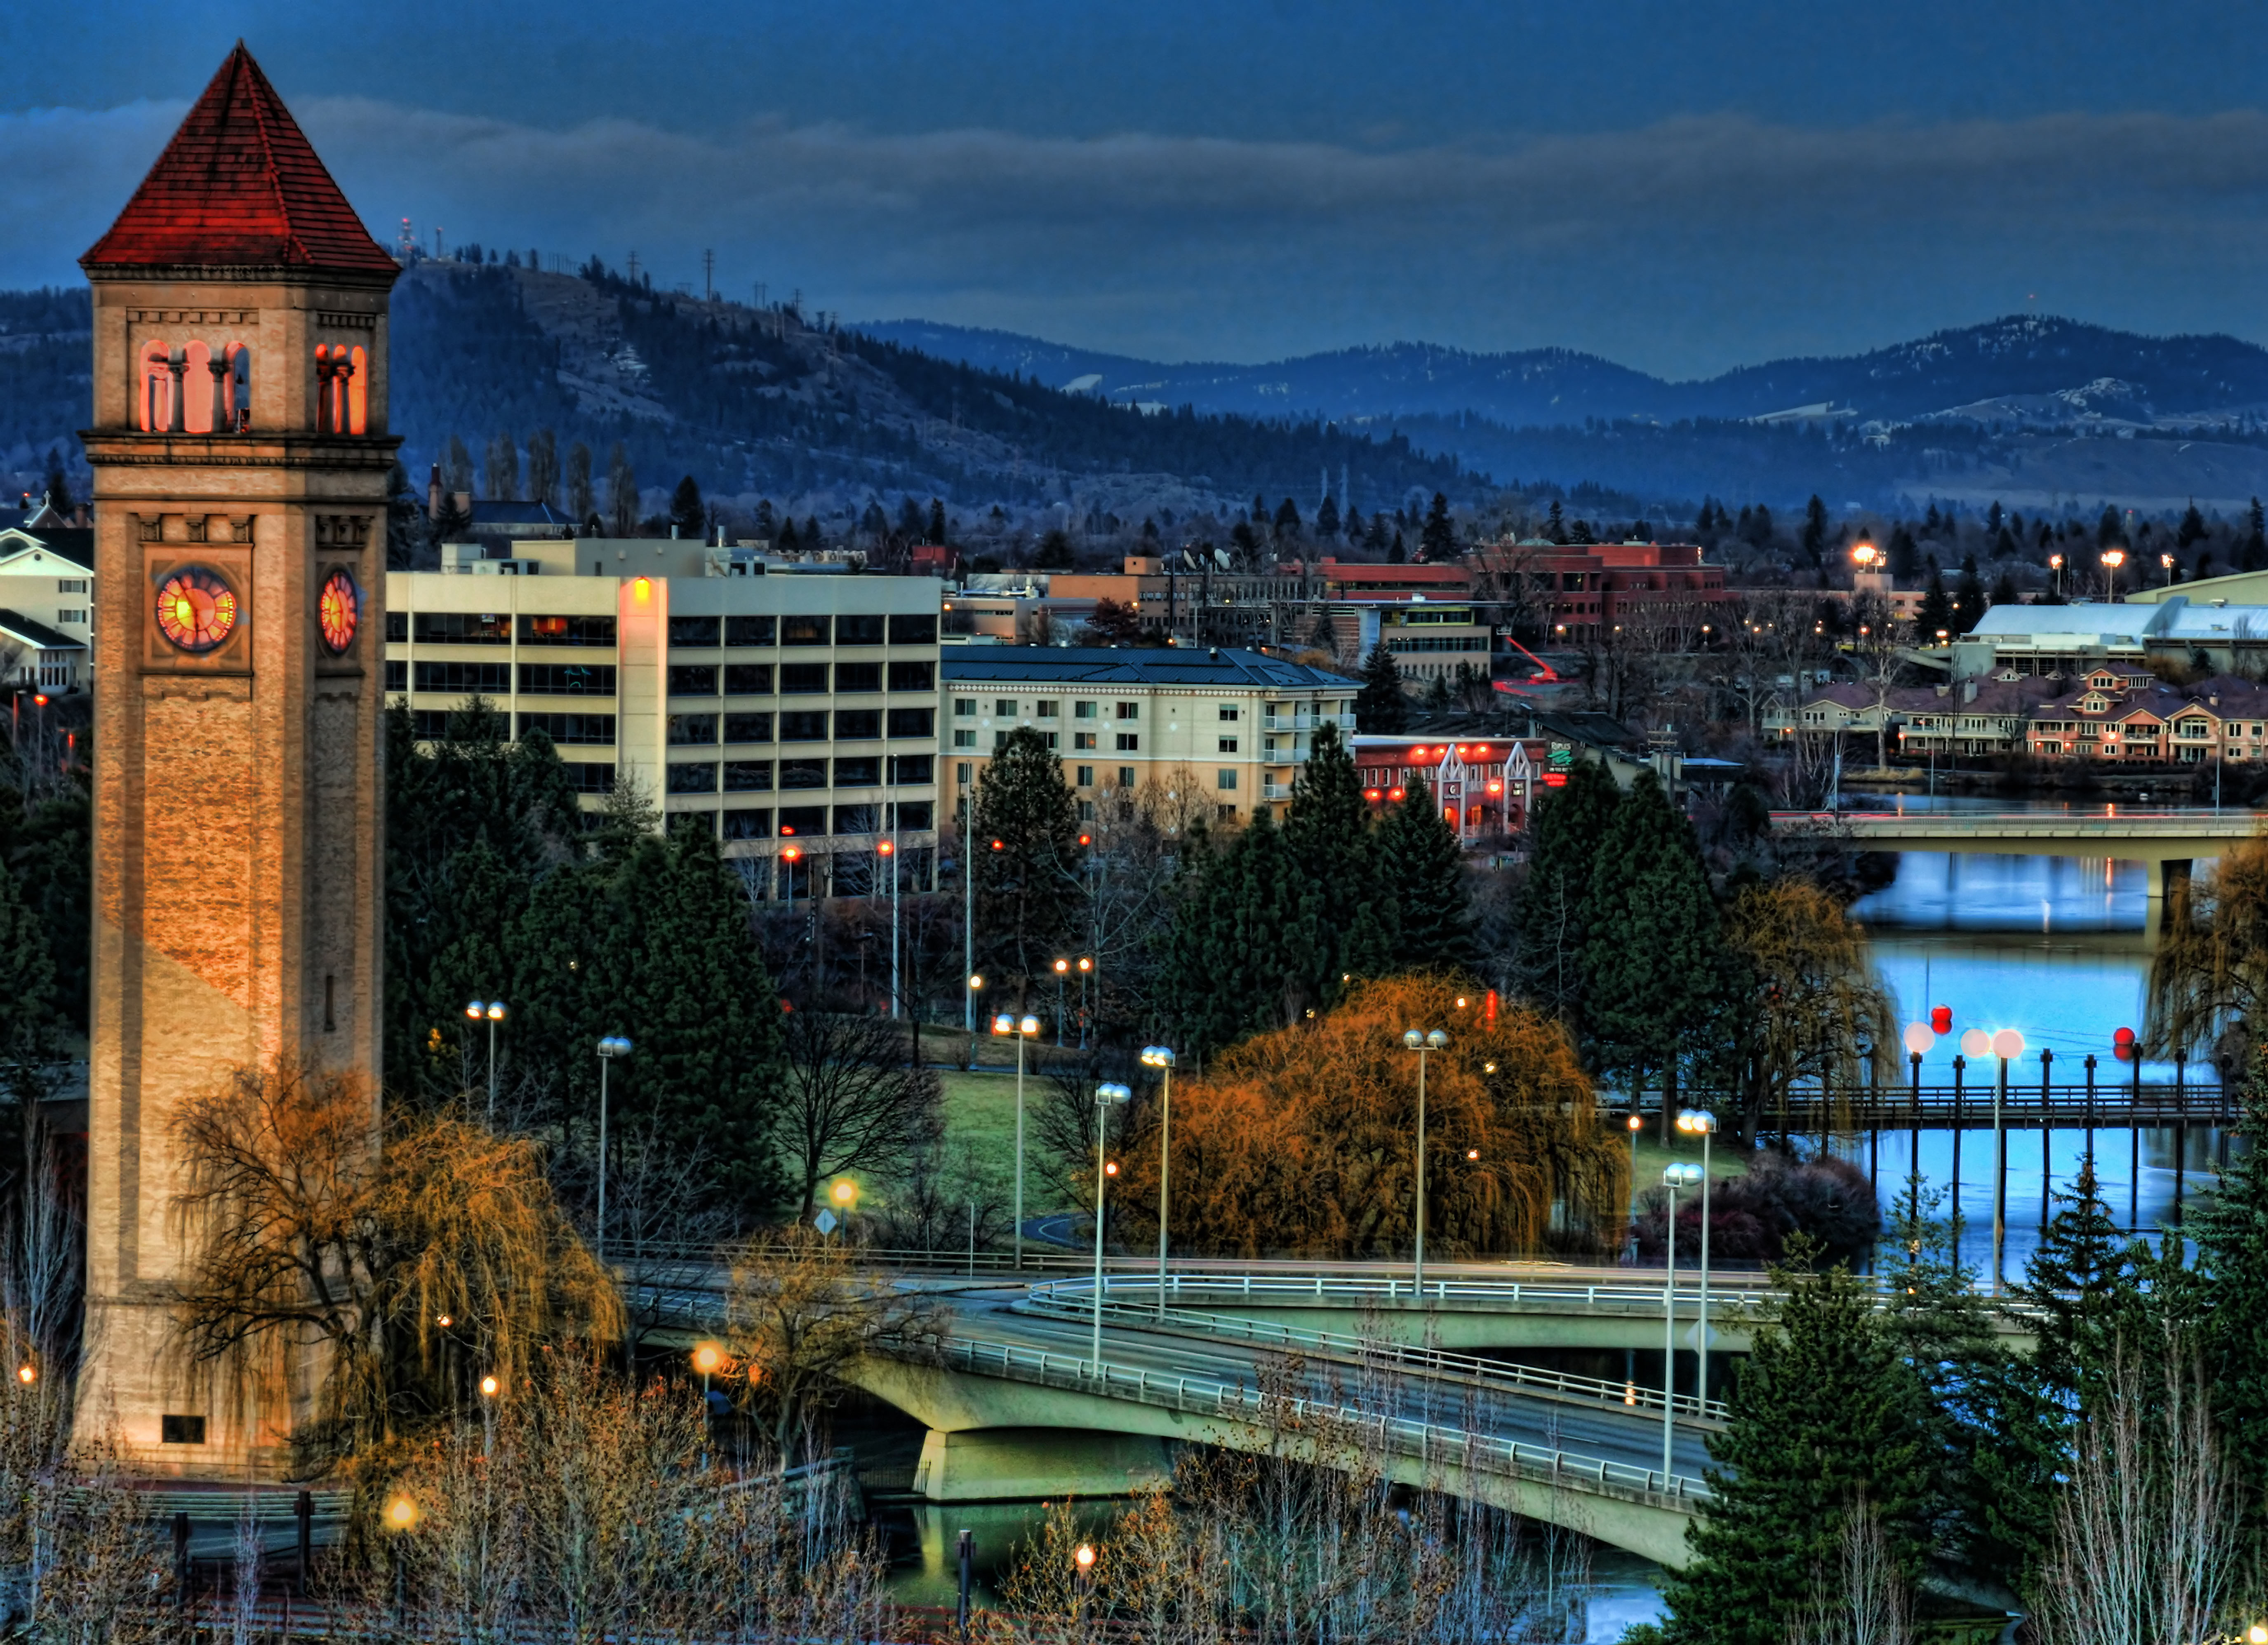 spokane 2012 update sah mdr news notices spokane spring recreation 5500x3990